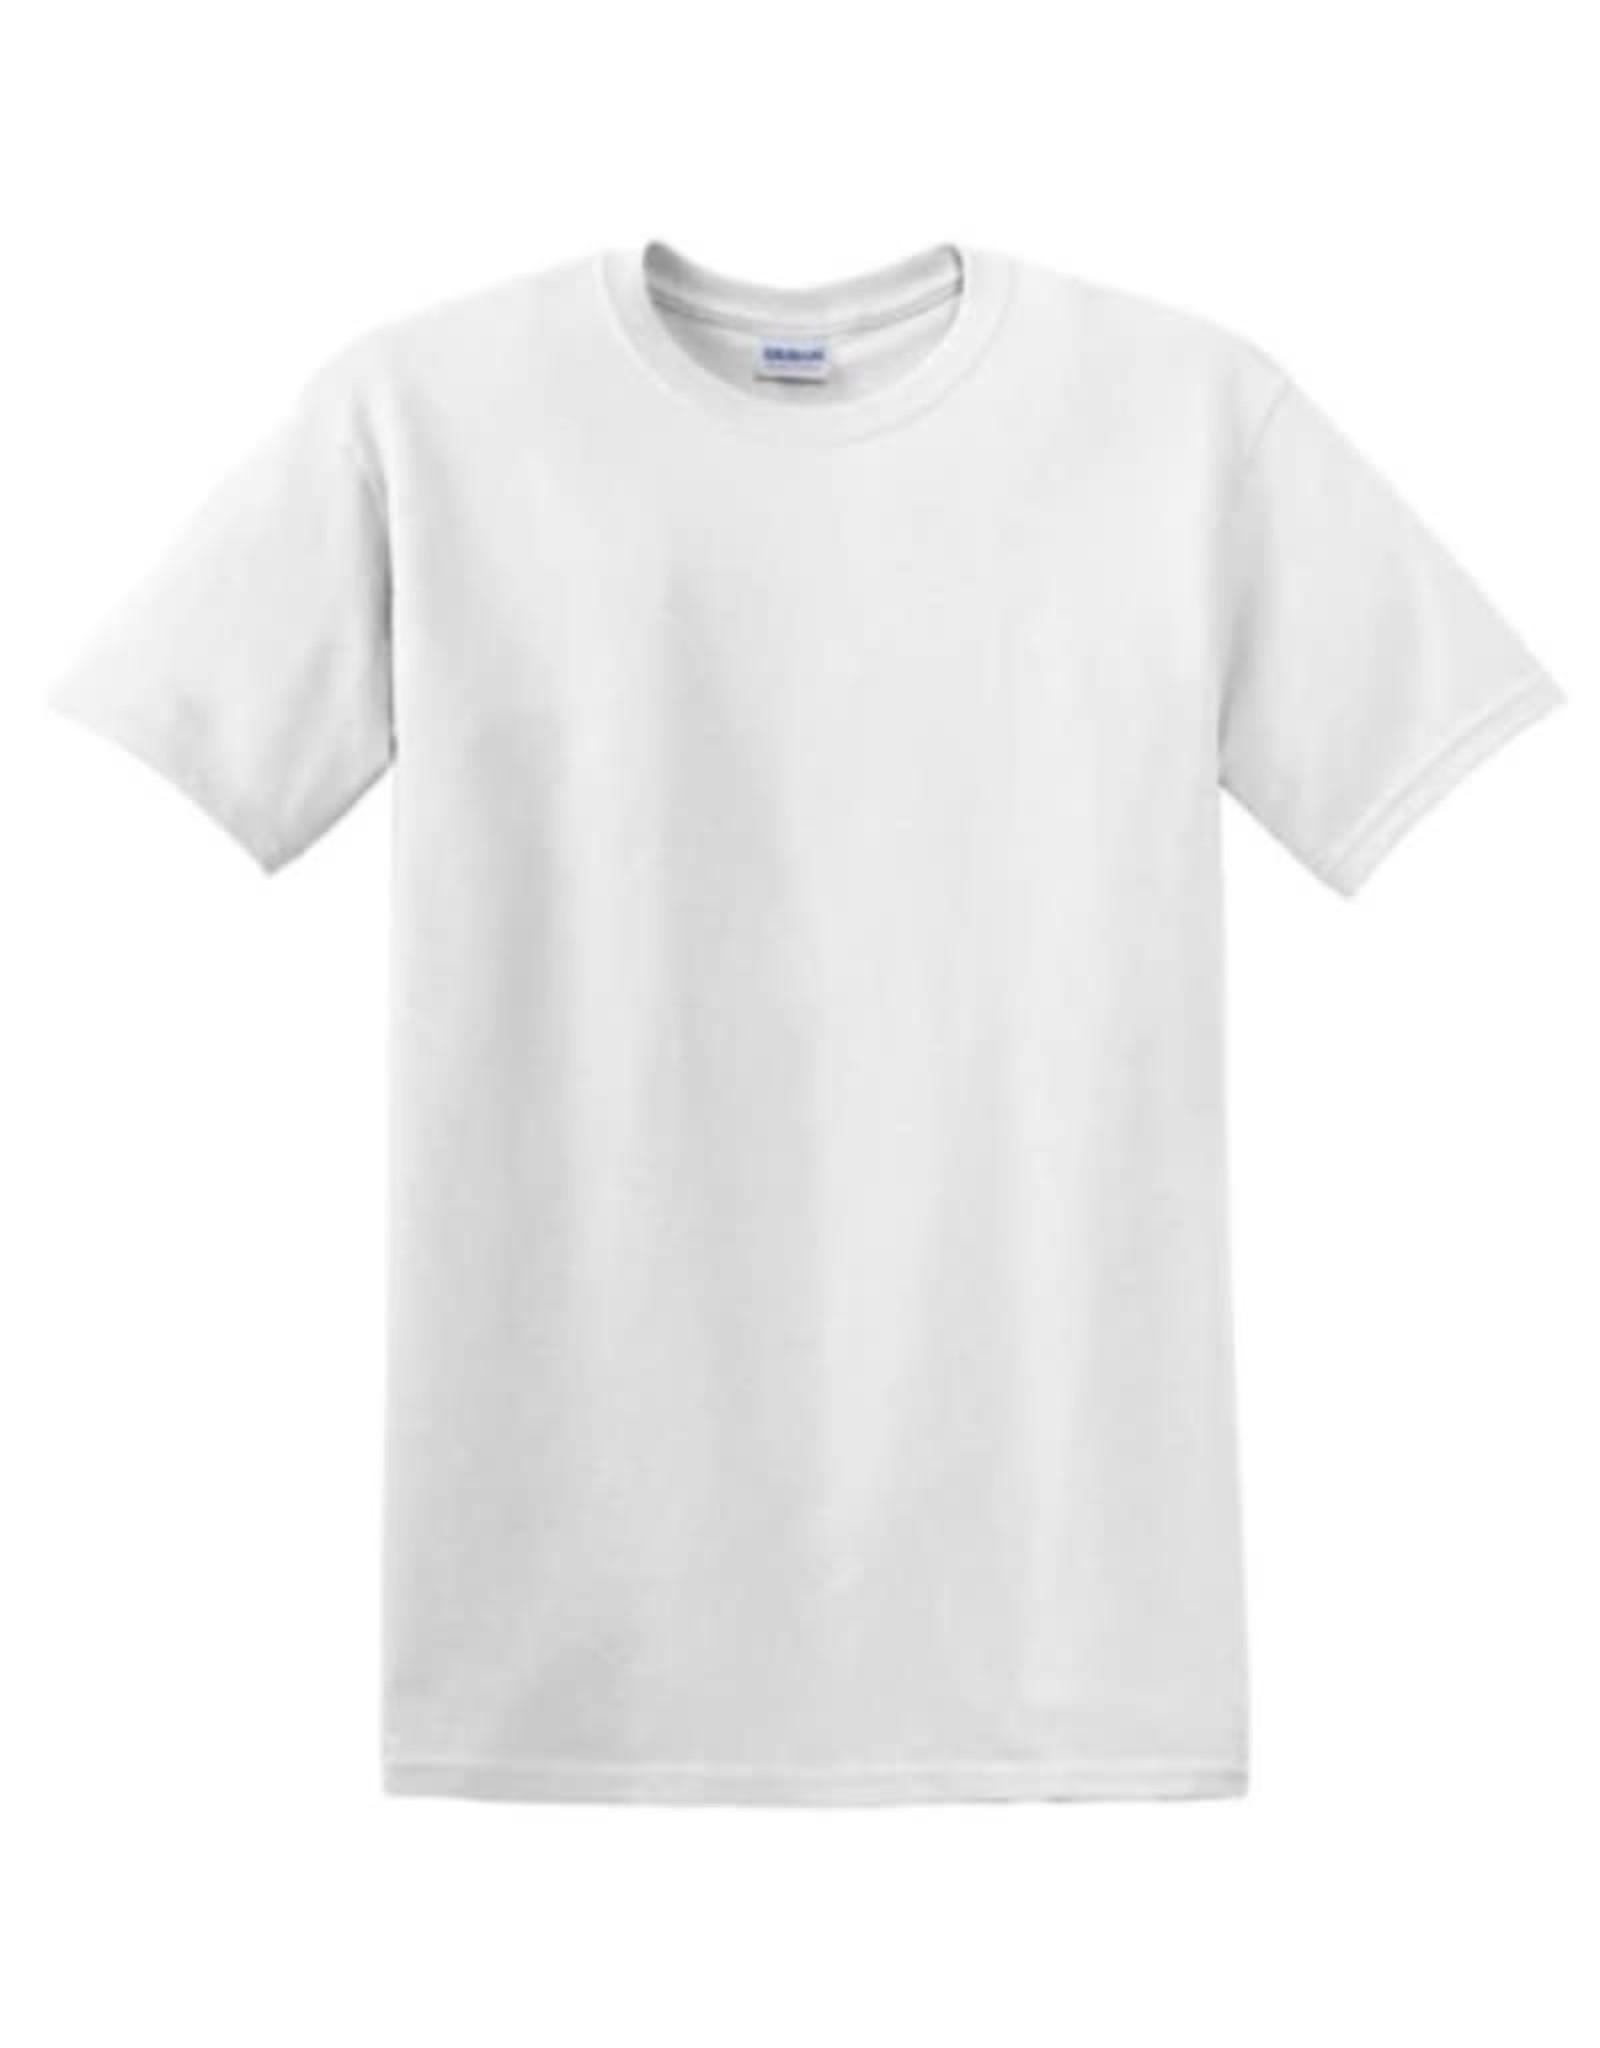 UNIFORM SHIRT - Saint Andrew Spirit Shirt